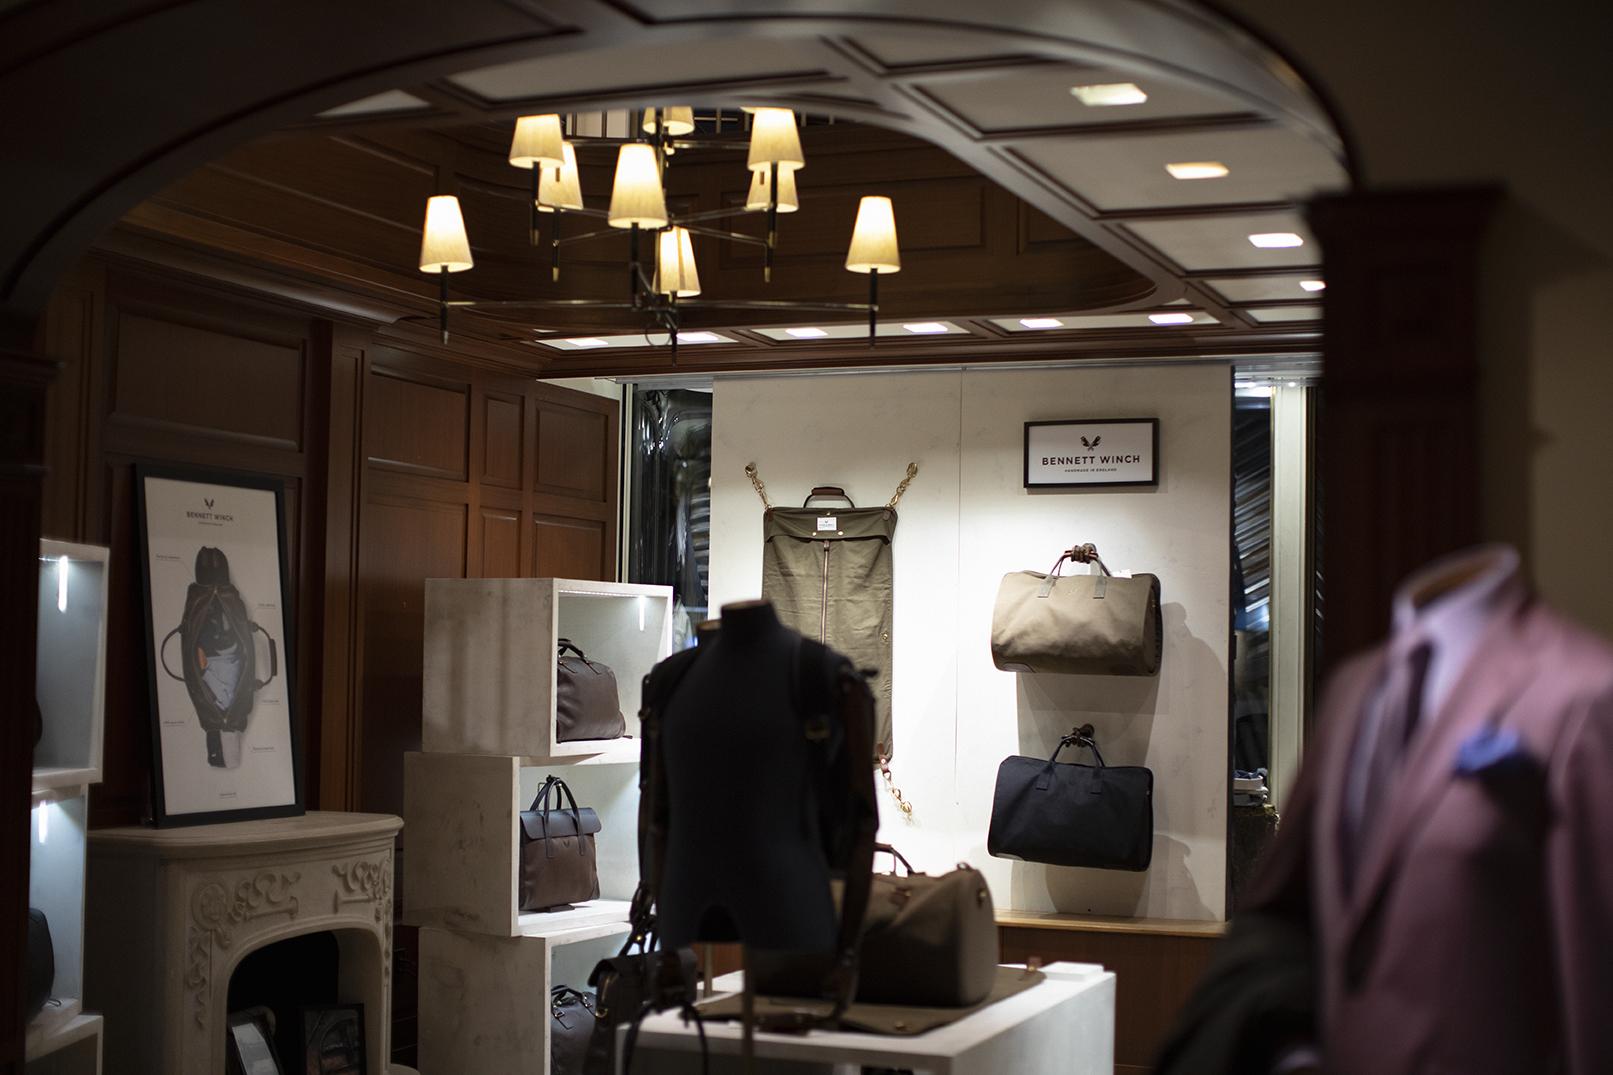 The Bennett Winch shop at Turnbull & Asser.